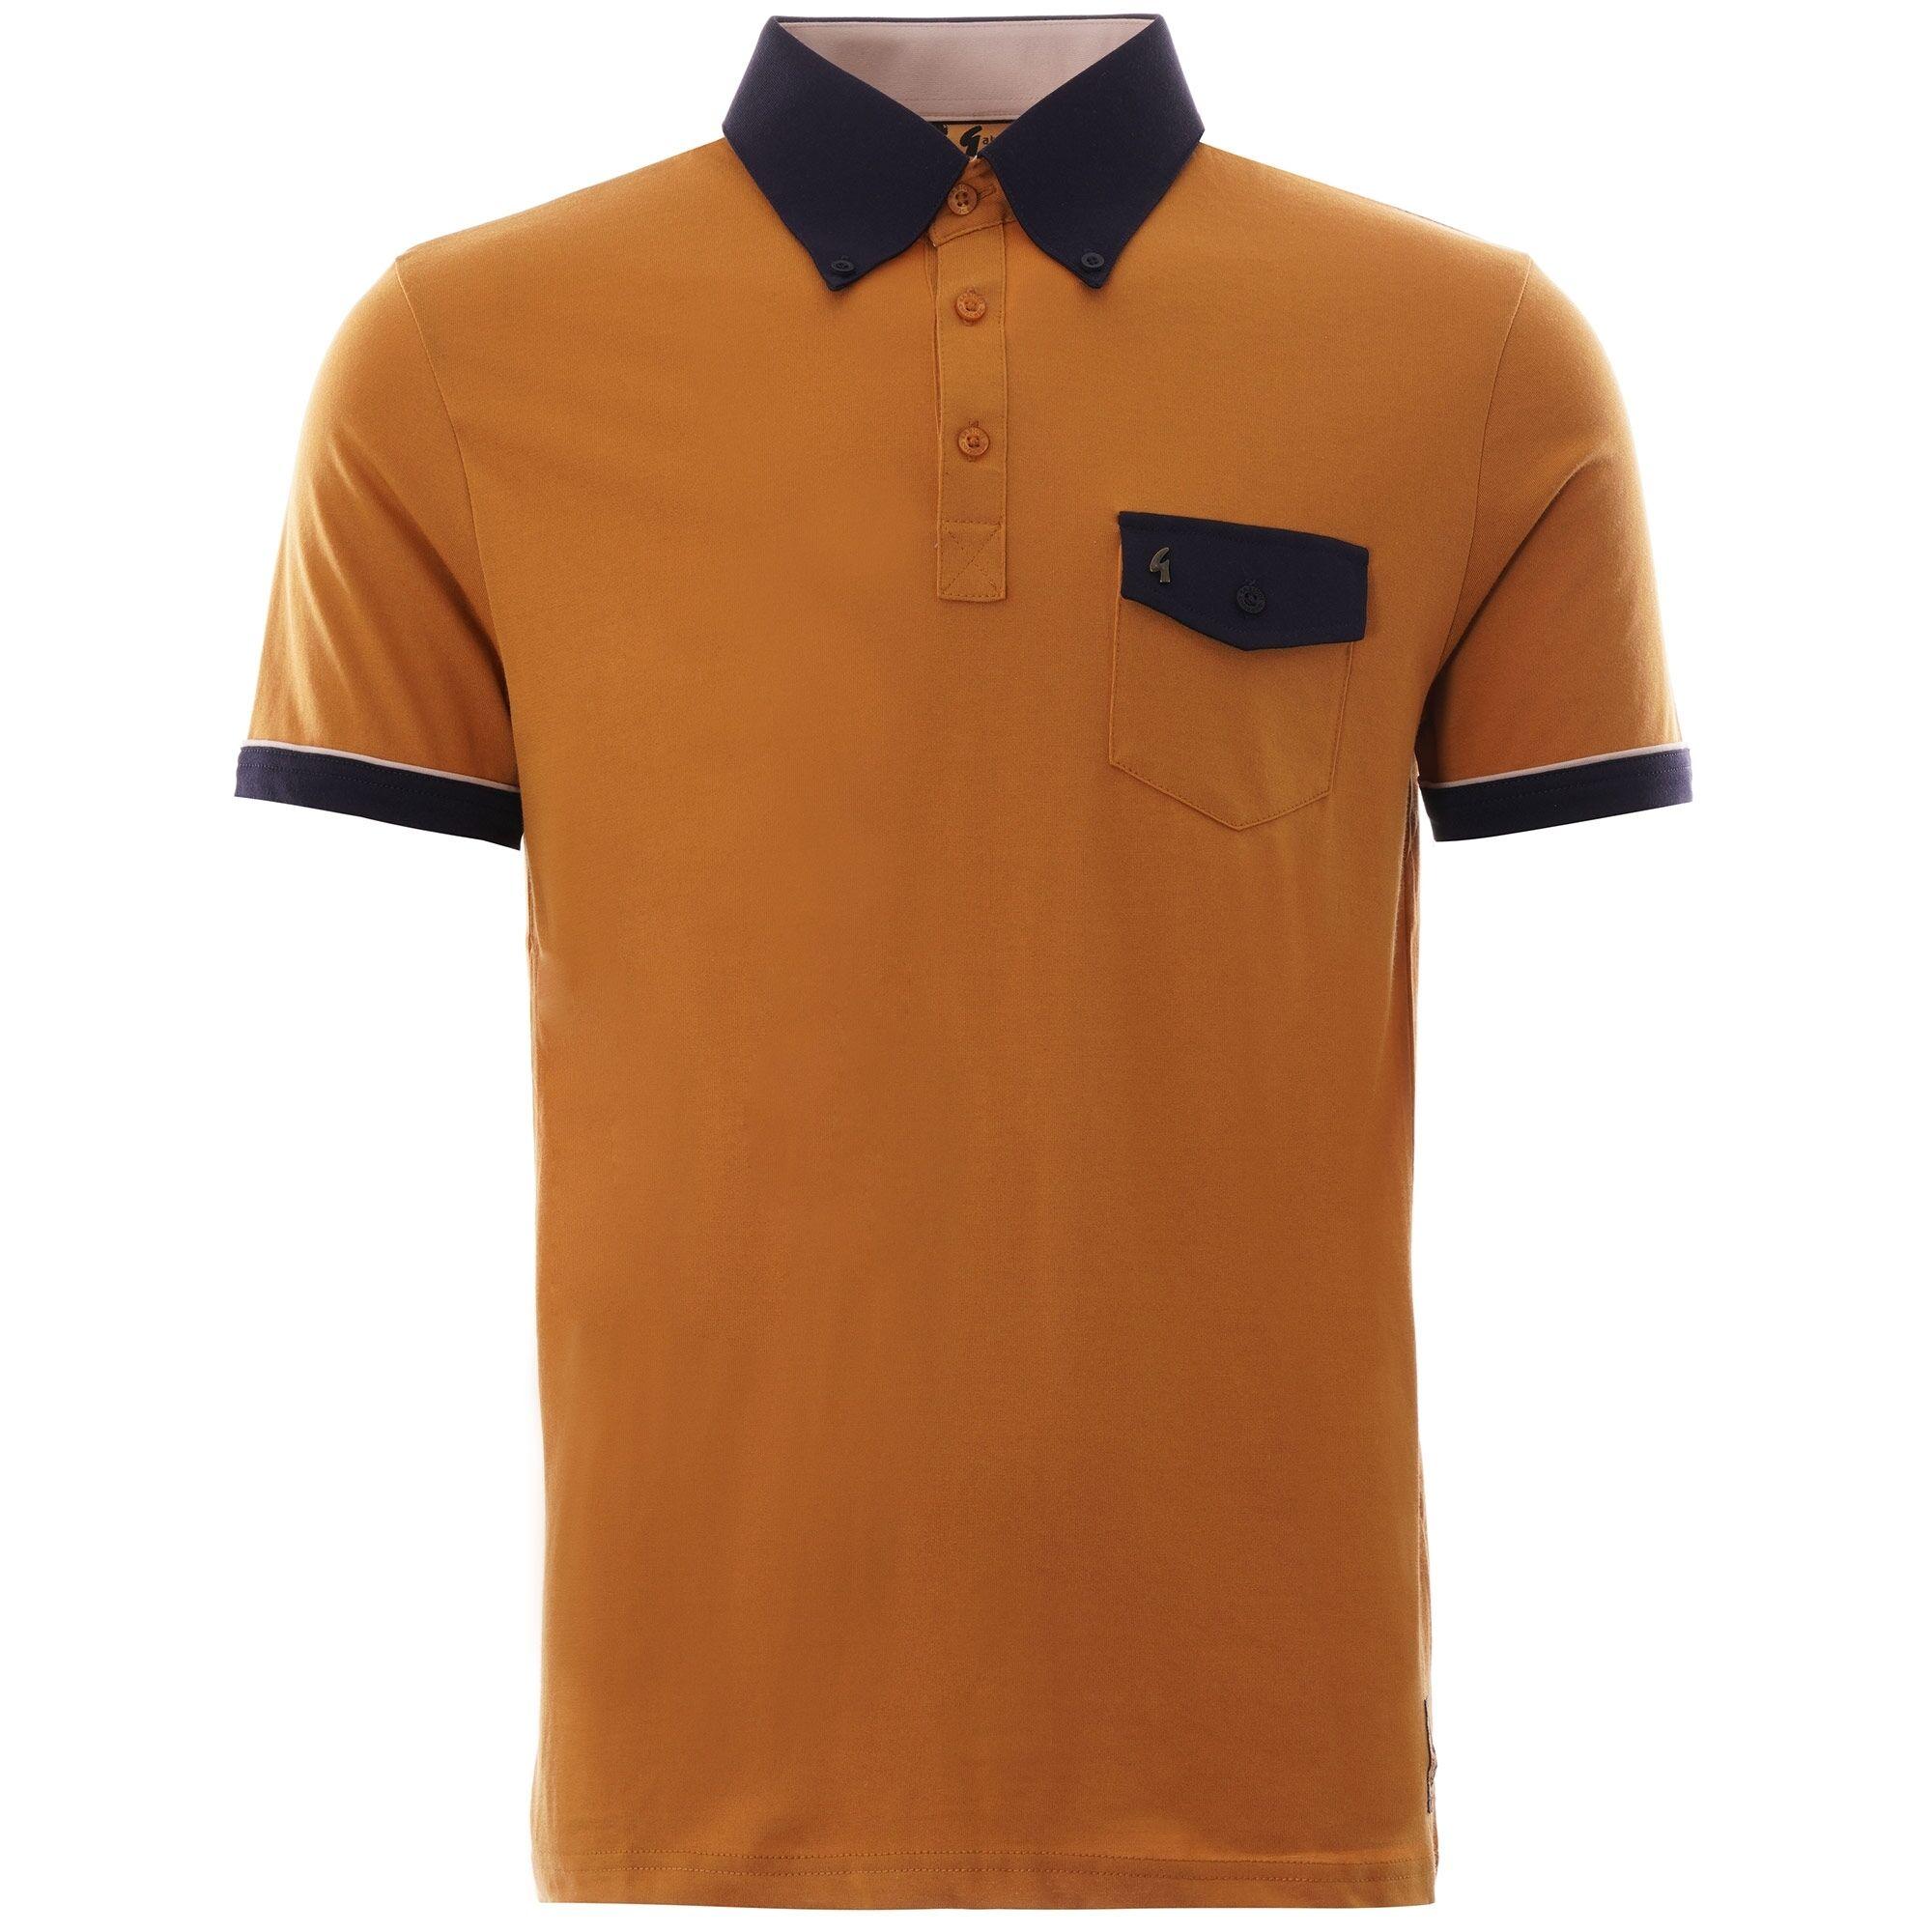 Gabicci Vintage 1973 Ganicci Cool Ruler Poloshirt   Hay  V44GIX01-HAY